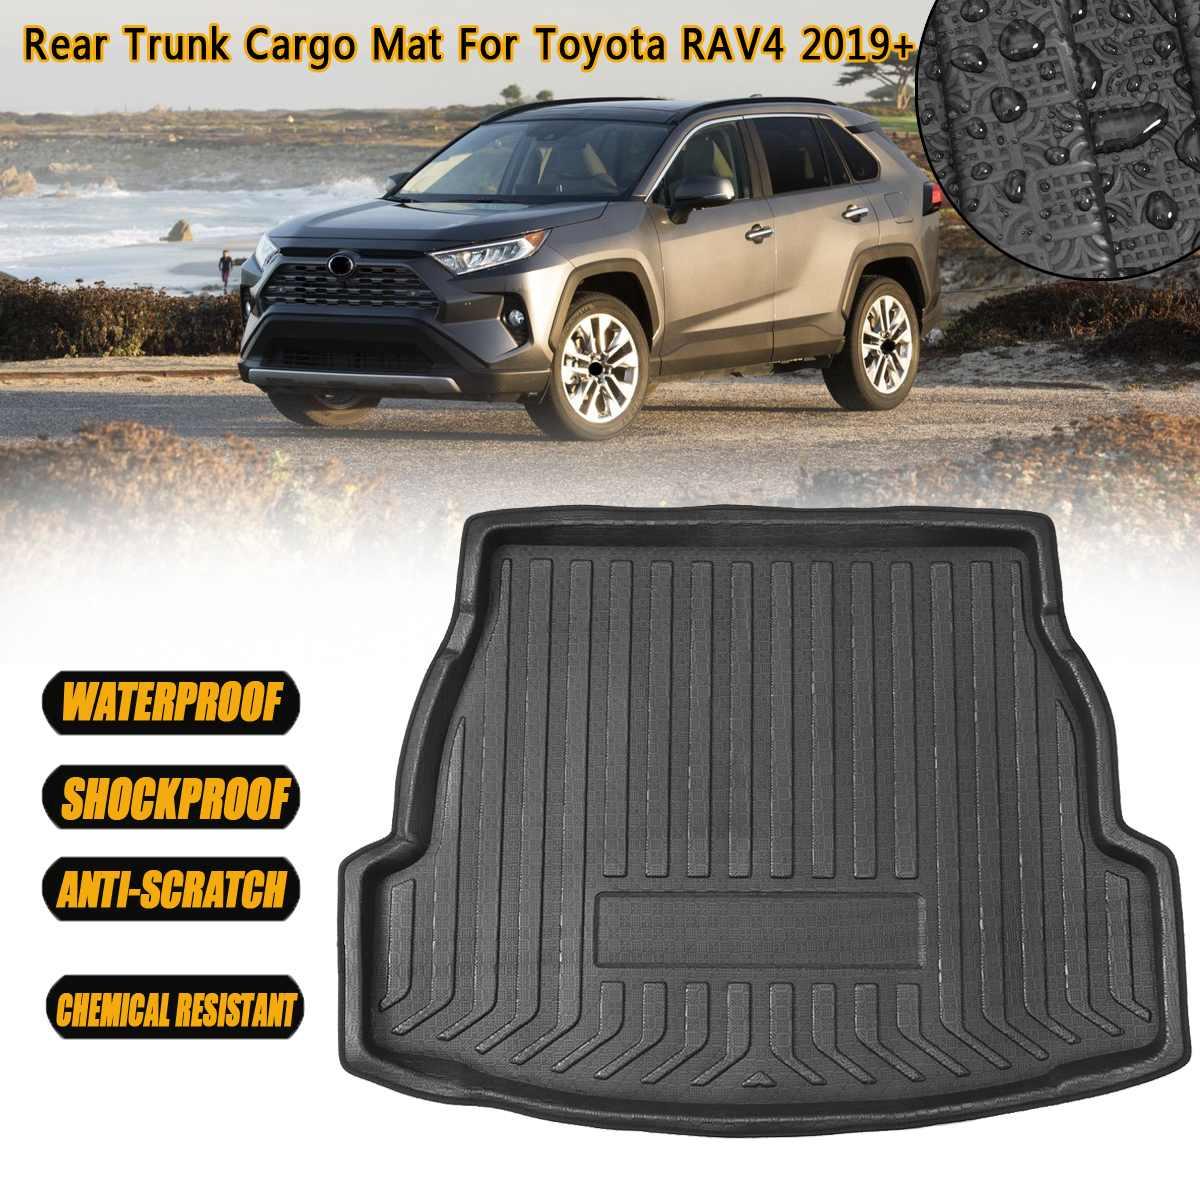 Rear Trunk Tray Cargo Boot Liner Mat Floor Carpet Accessories For Toyota RAV4 2006 2007 2008 2009 2010 2011 2012 2013-2019+